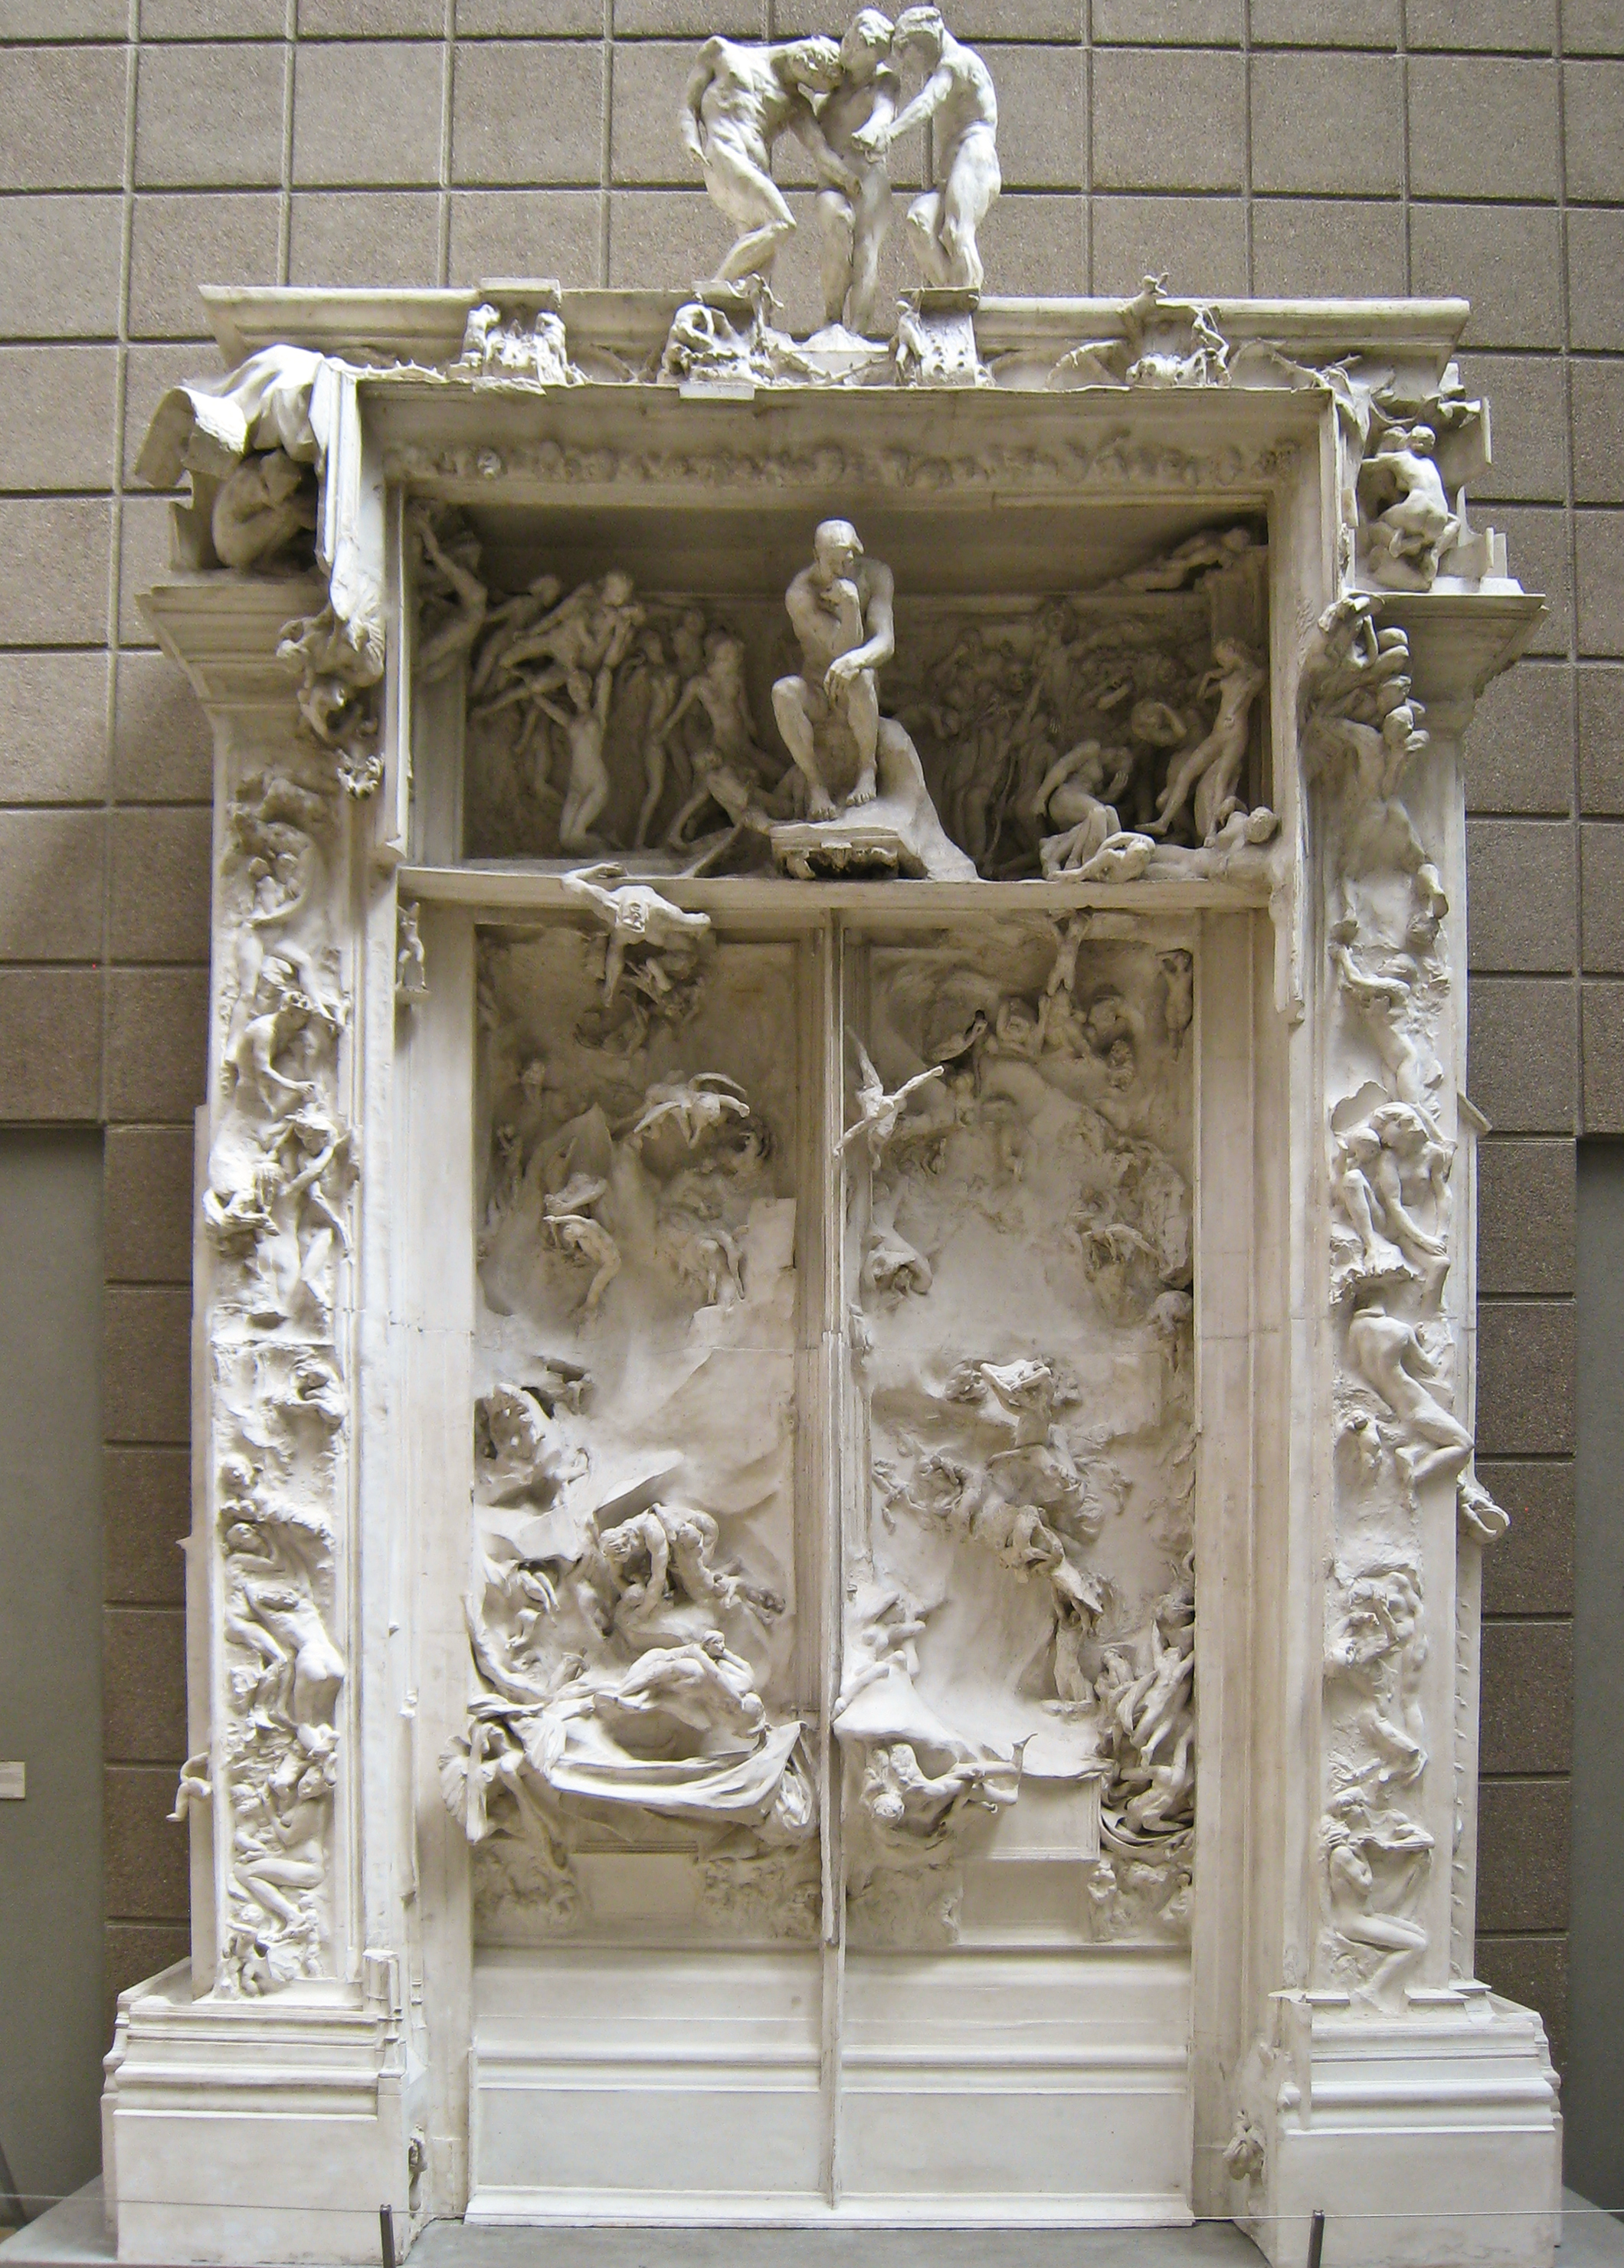 File auguste rodin porte de l 39 enfer 1880 1917 3807828604 jpg wikimedia commons - La porte de l enfer rodin ...